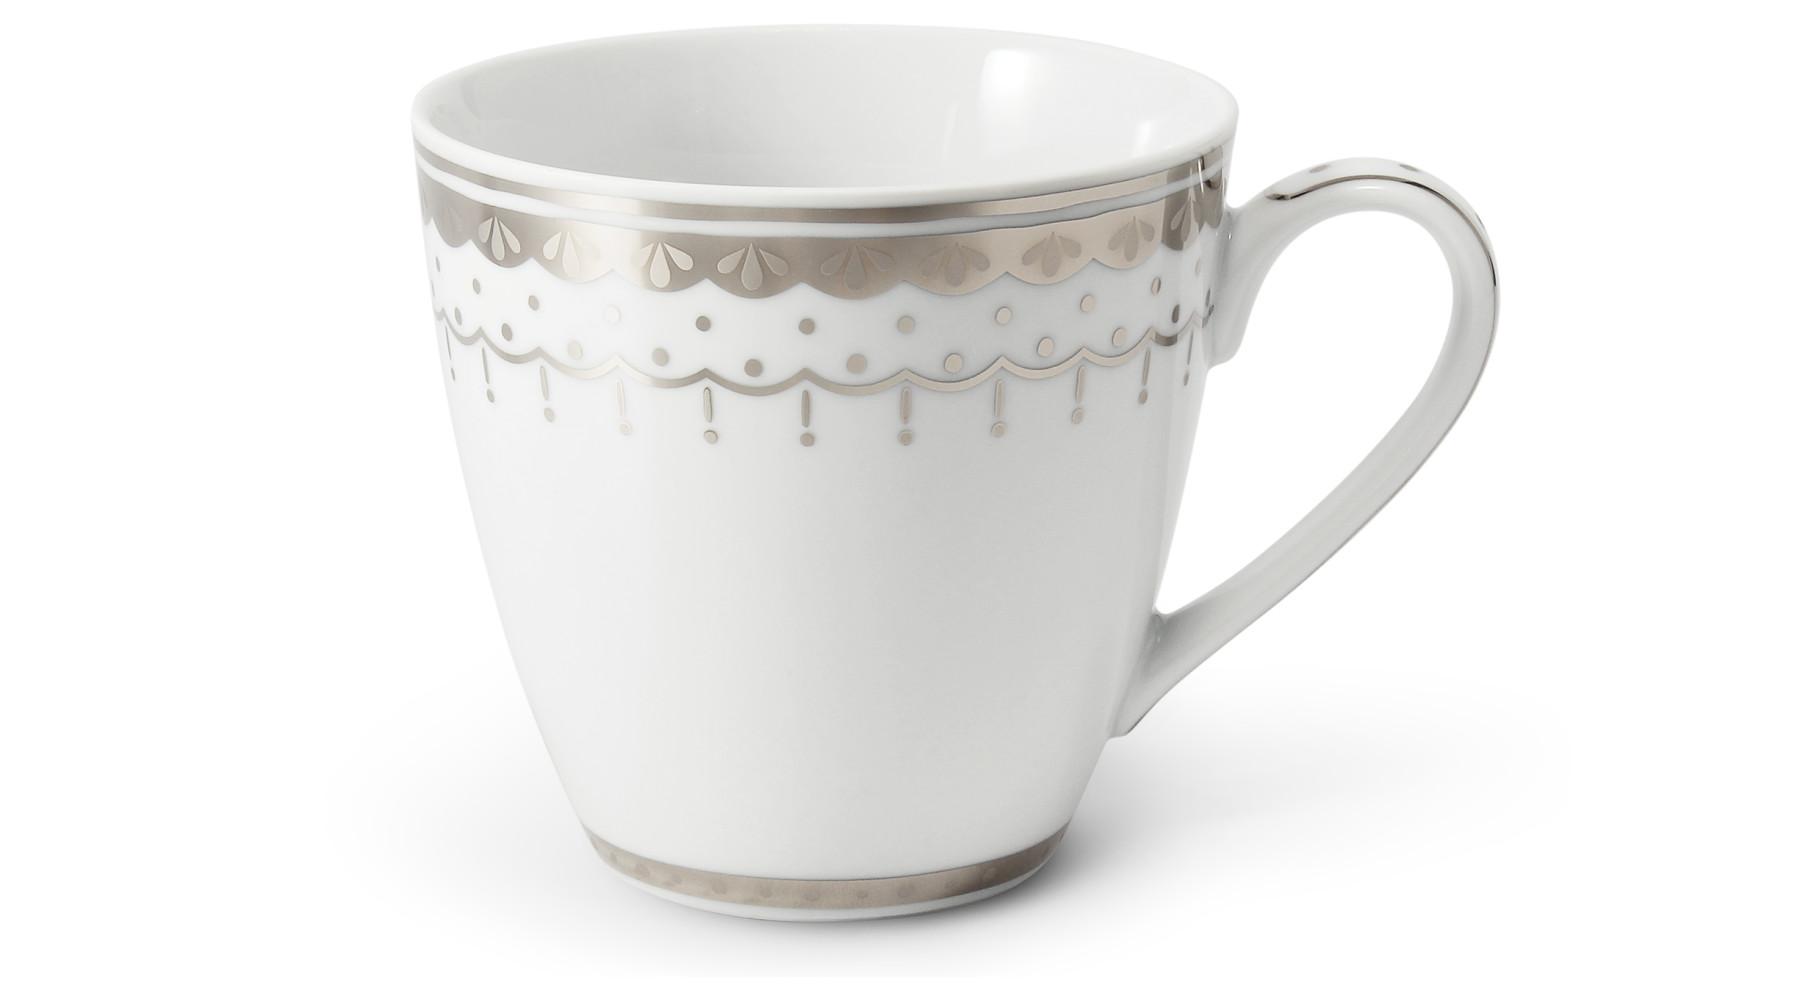 Teetasse 0,30 l HyggeLine Platin var.2